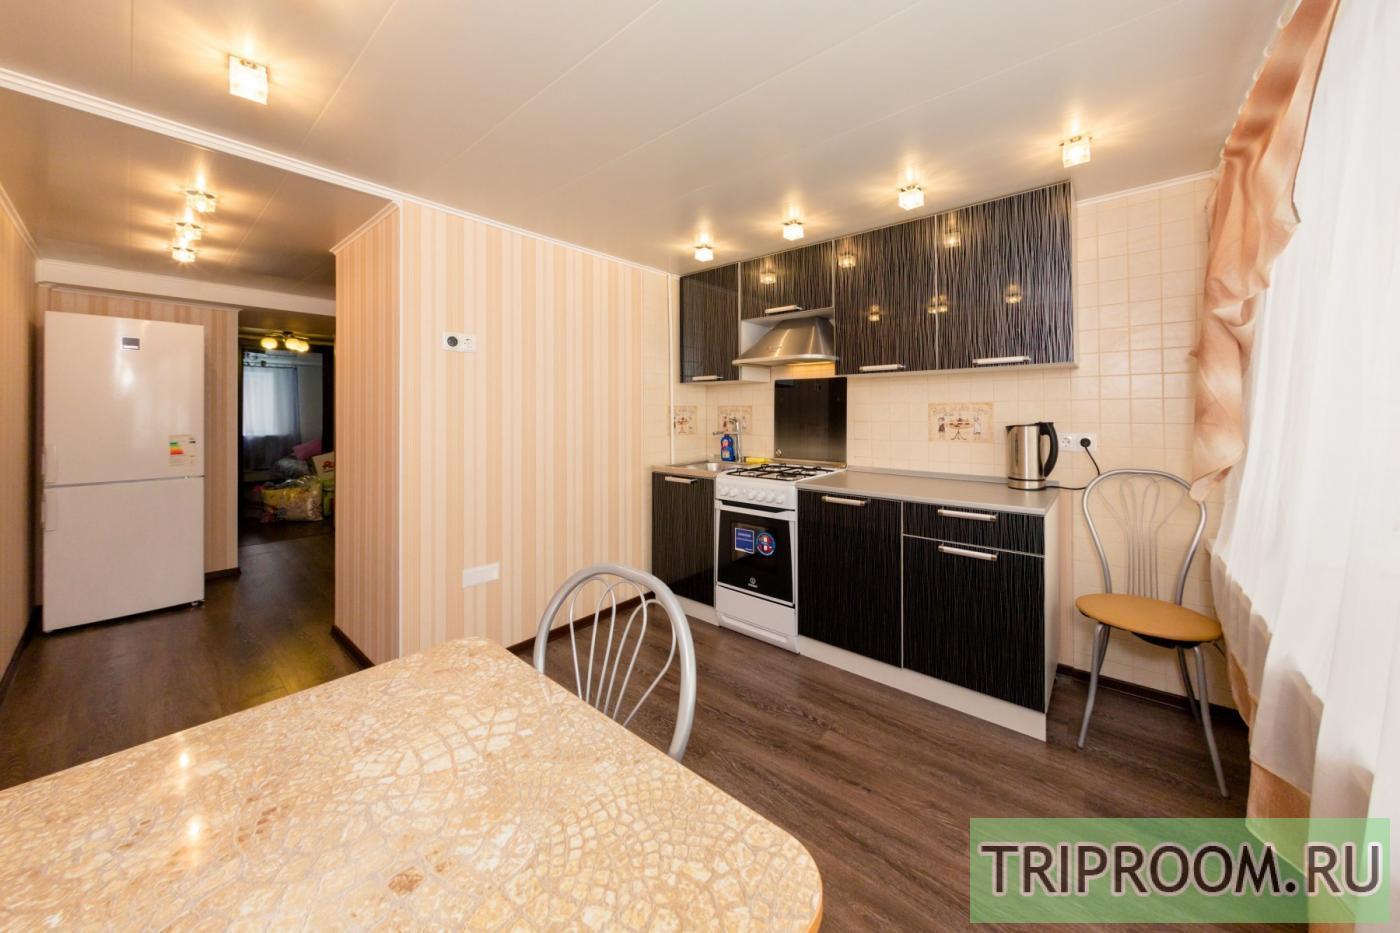 2-комнатная квартира посуточно (вариант № 33340), ул. Виленский переулок, фото № 9